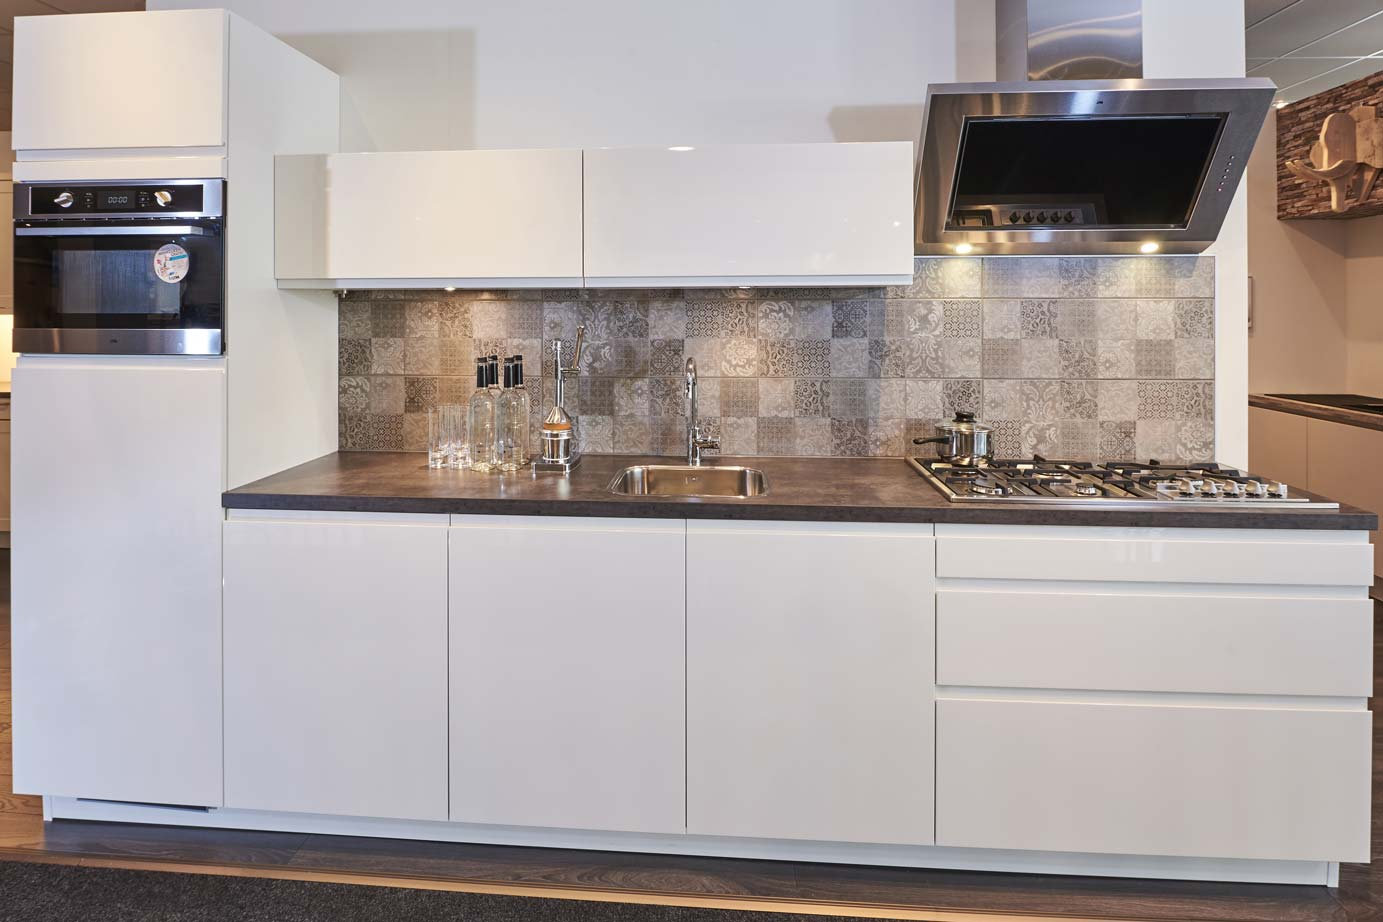 Greeploze Design Keukens : Greeploze keuken strak en modern design db keukens